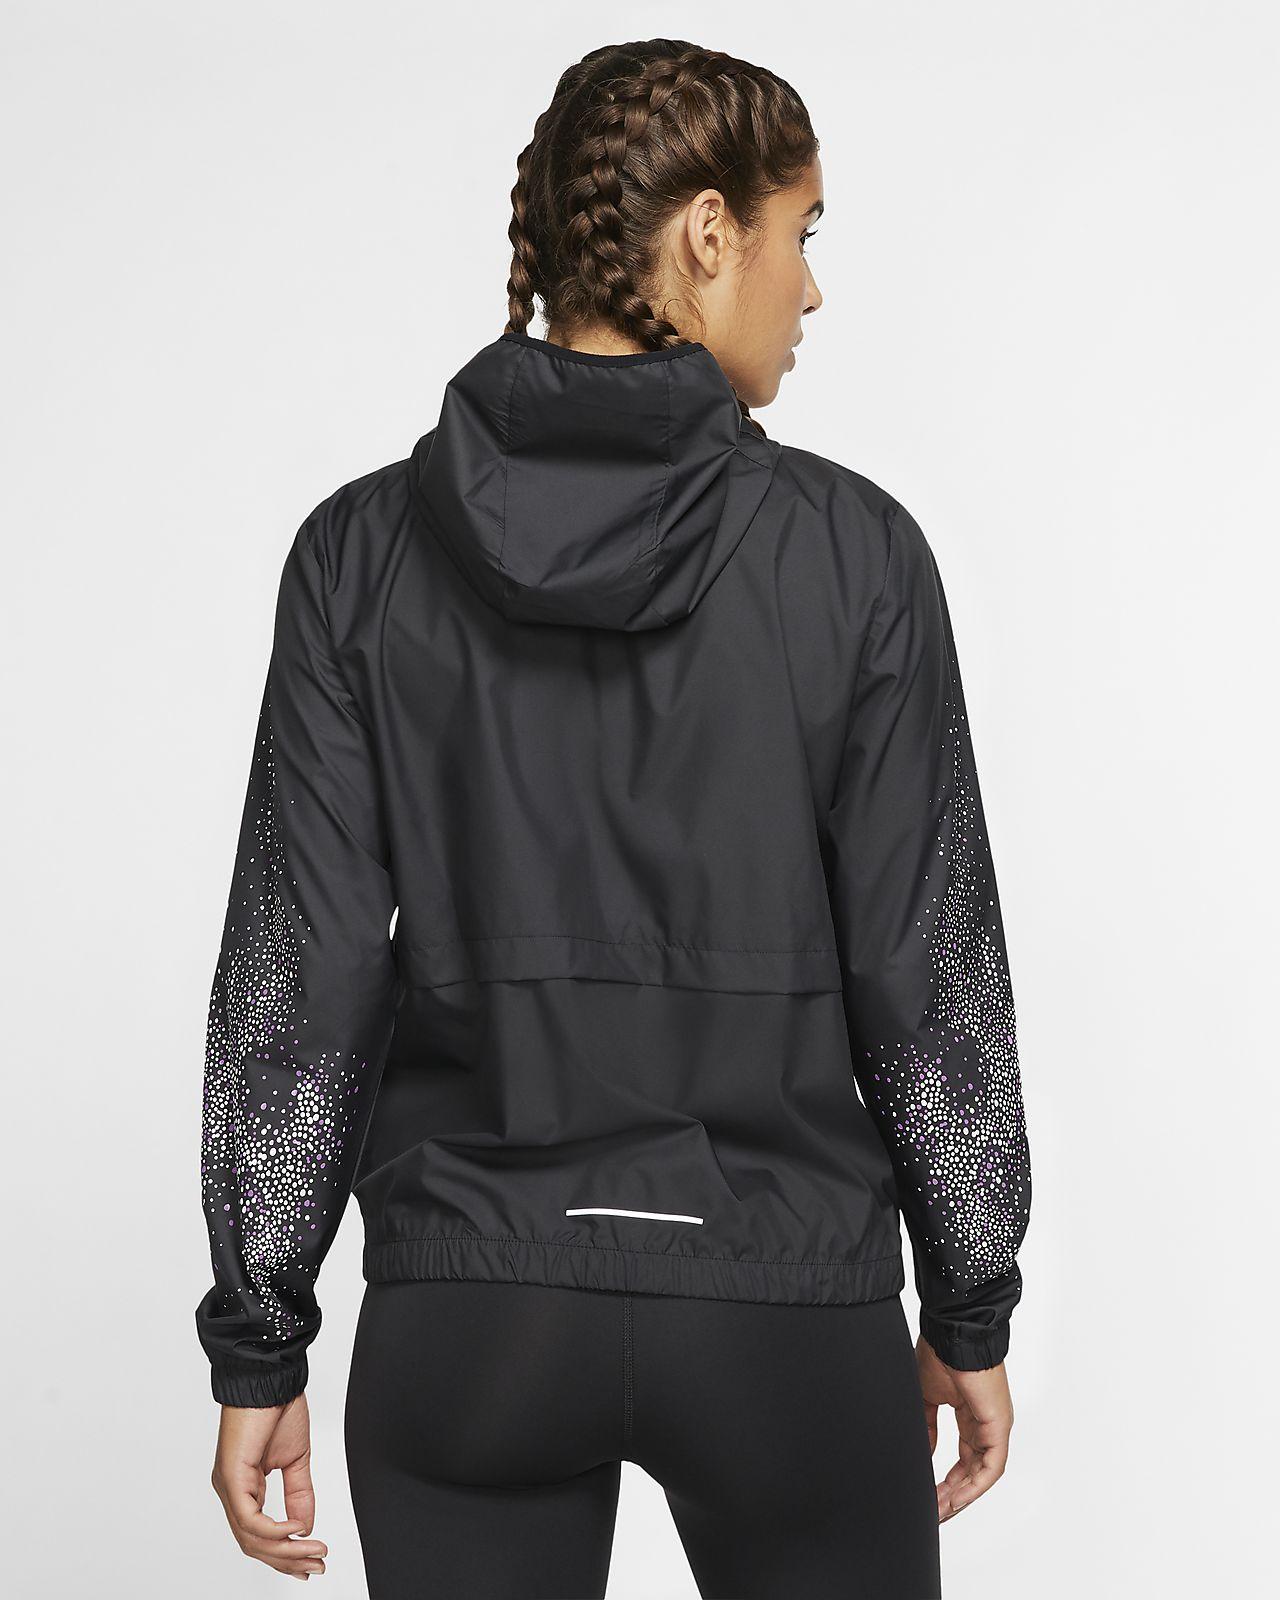 Nike Essential Women's Full Zip Running Jacket